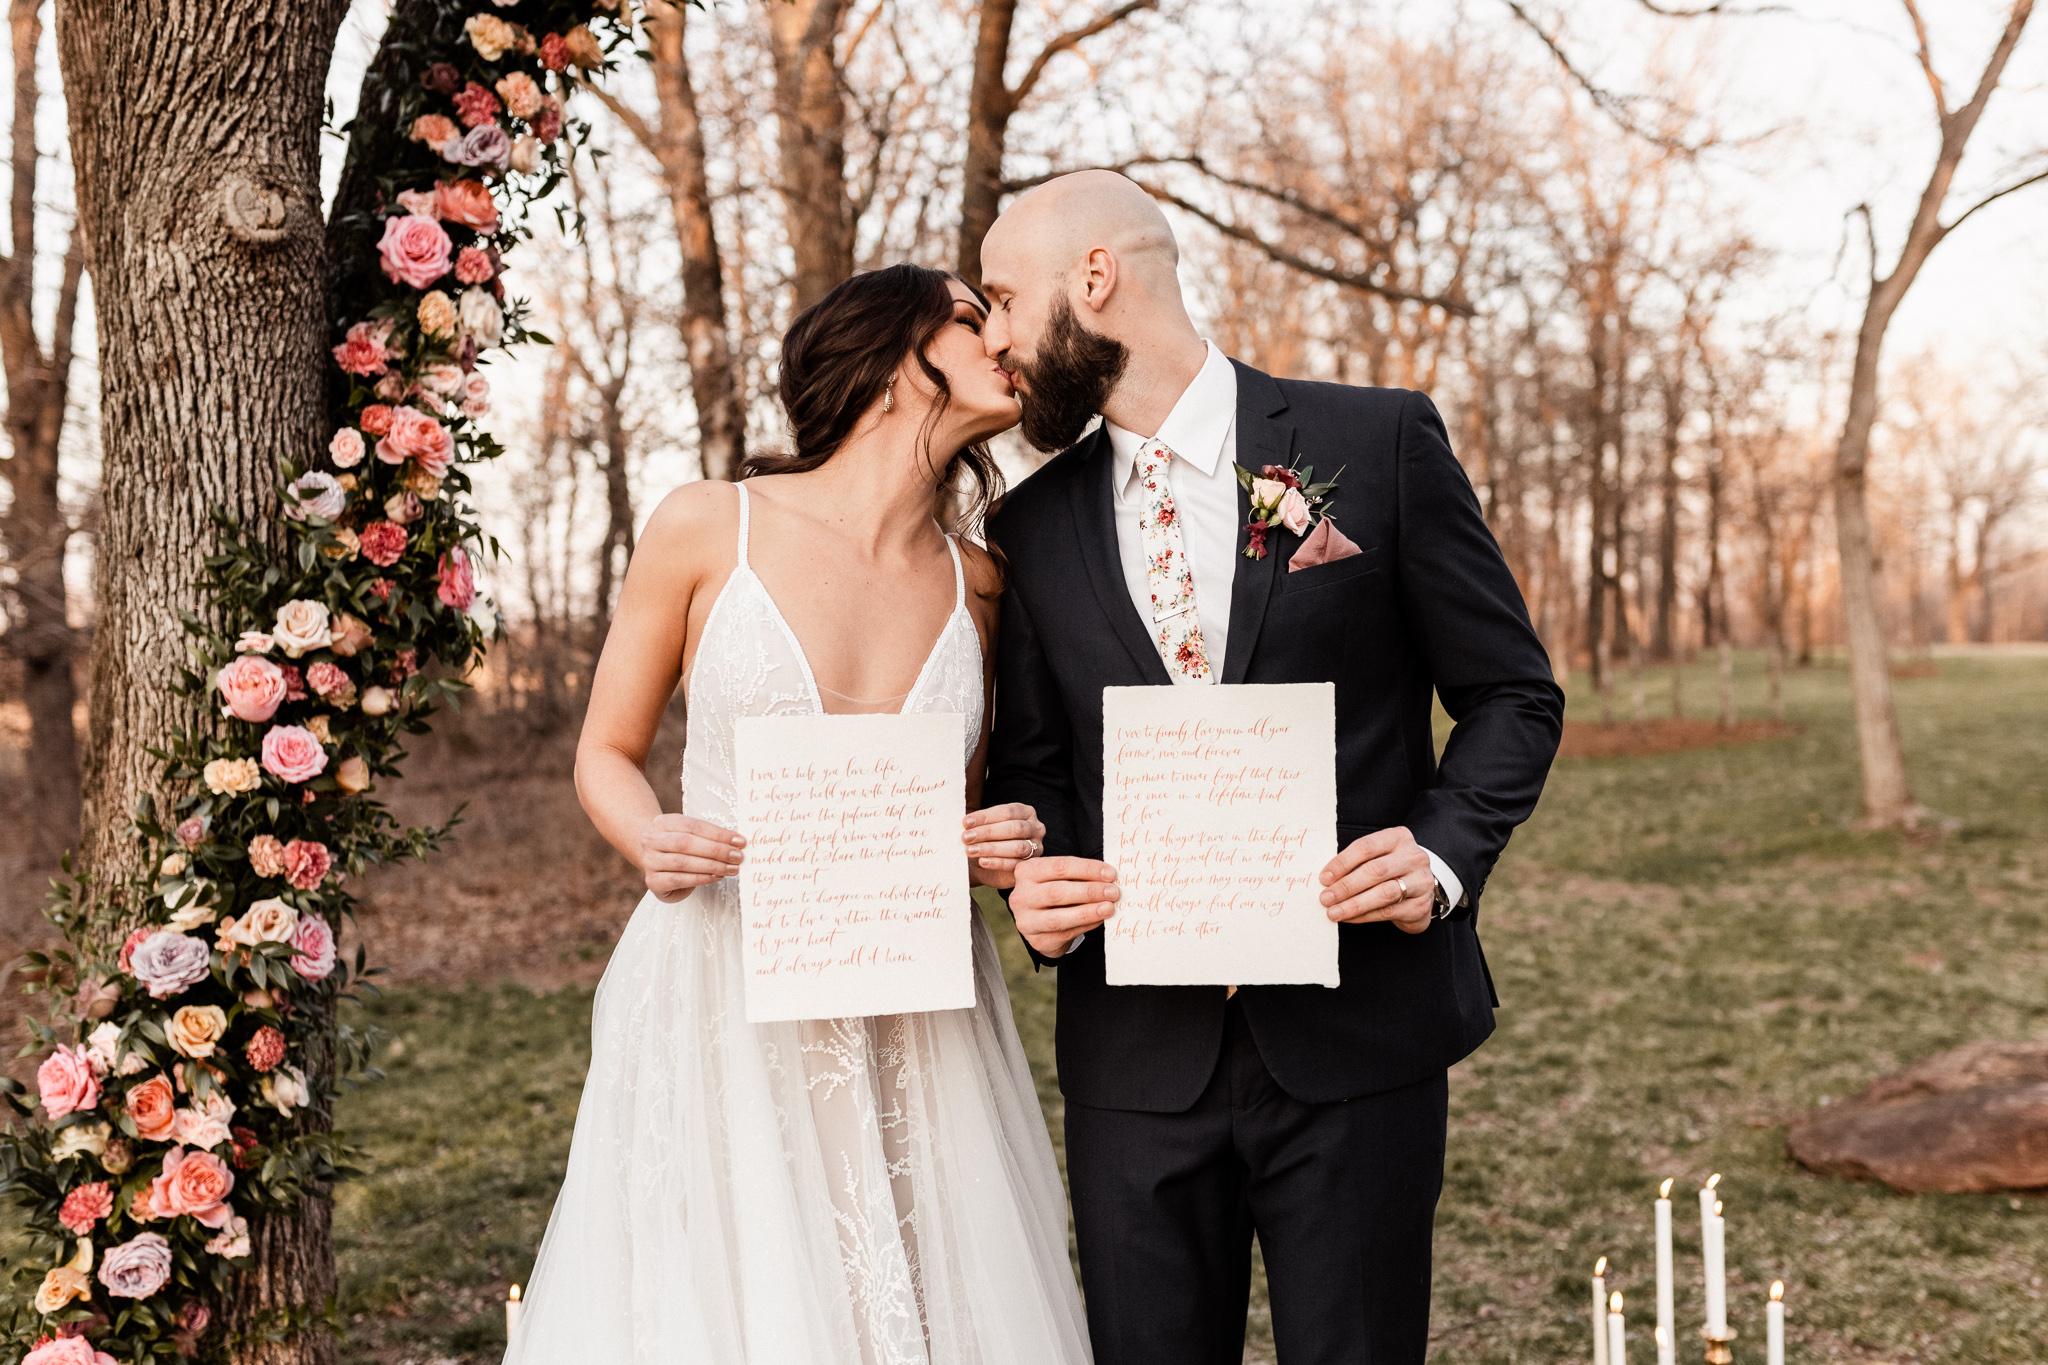 Cultivate Event Planning Styled Shoot   Colorful Romantic Barn Wedding Inspo   Oklahoma Wedding Photographer-88.jpg